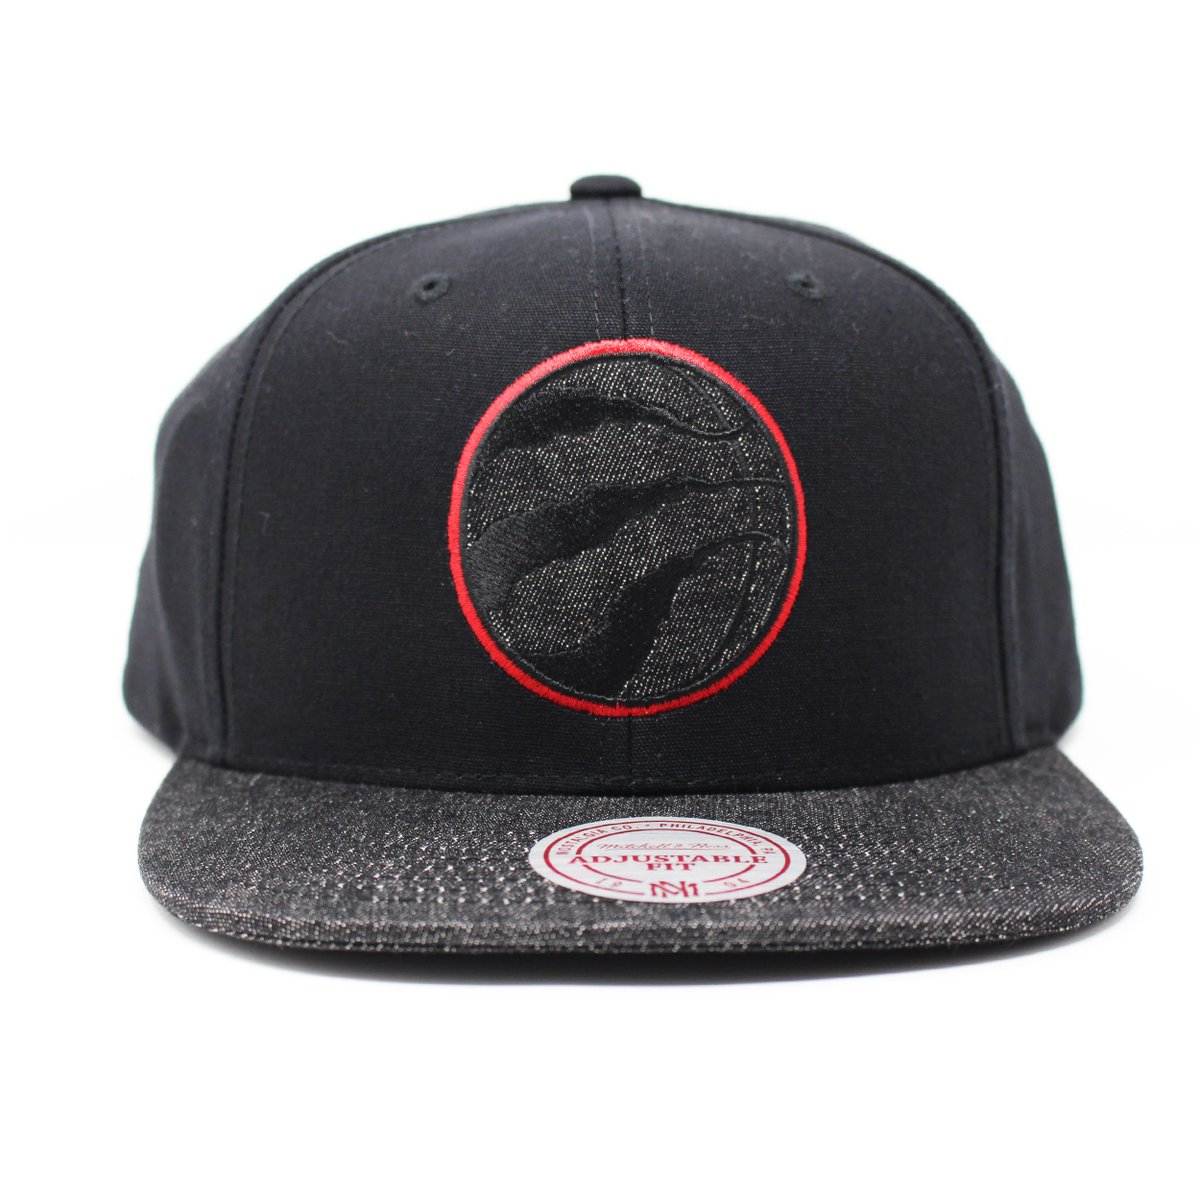 fd2c0704591064 ... #raptors #basketball #nba · #grey #red #white #black #game #sports  #goal #logo #snapback #hat #cap #black #fashionpic.twitter.com/h3Pq2X6koZ